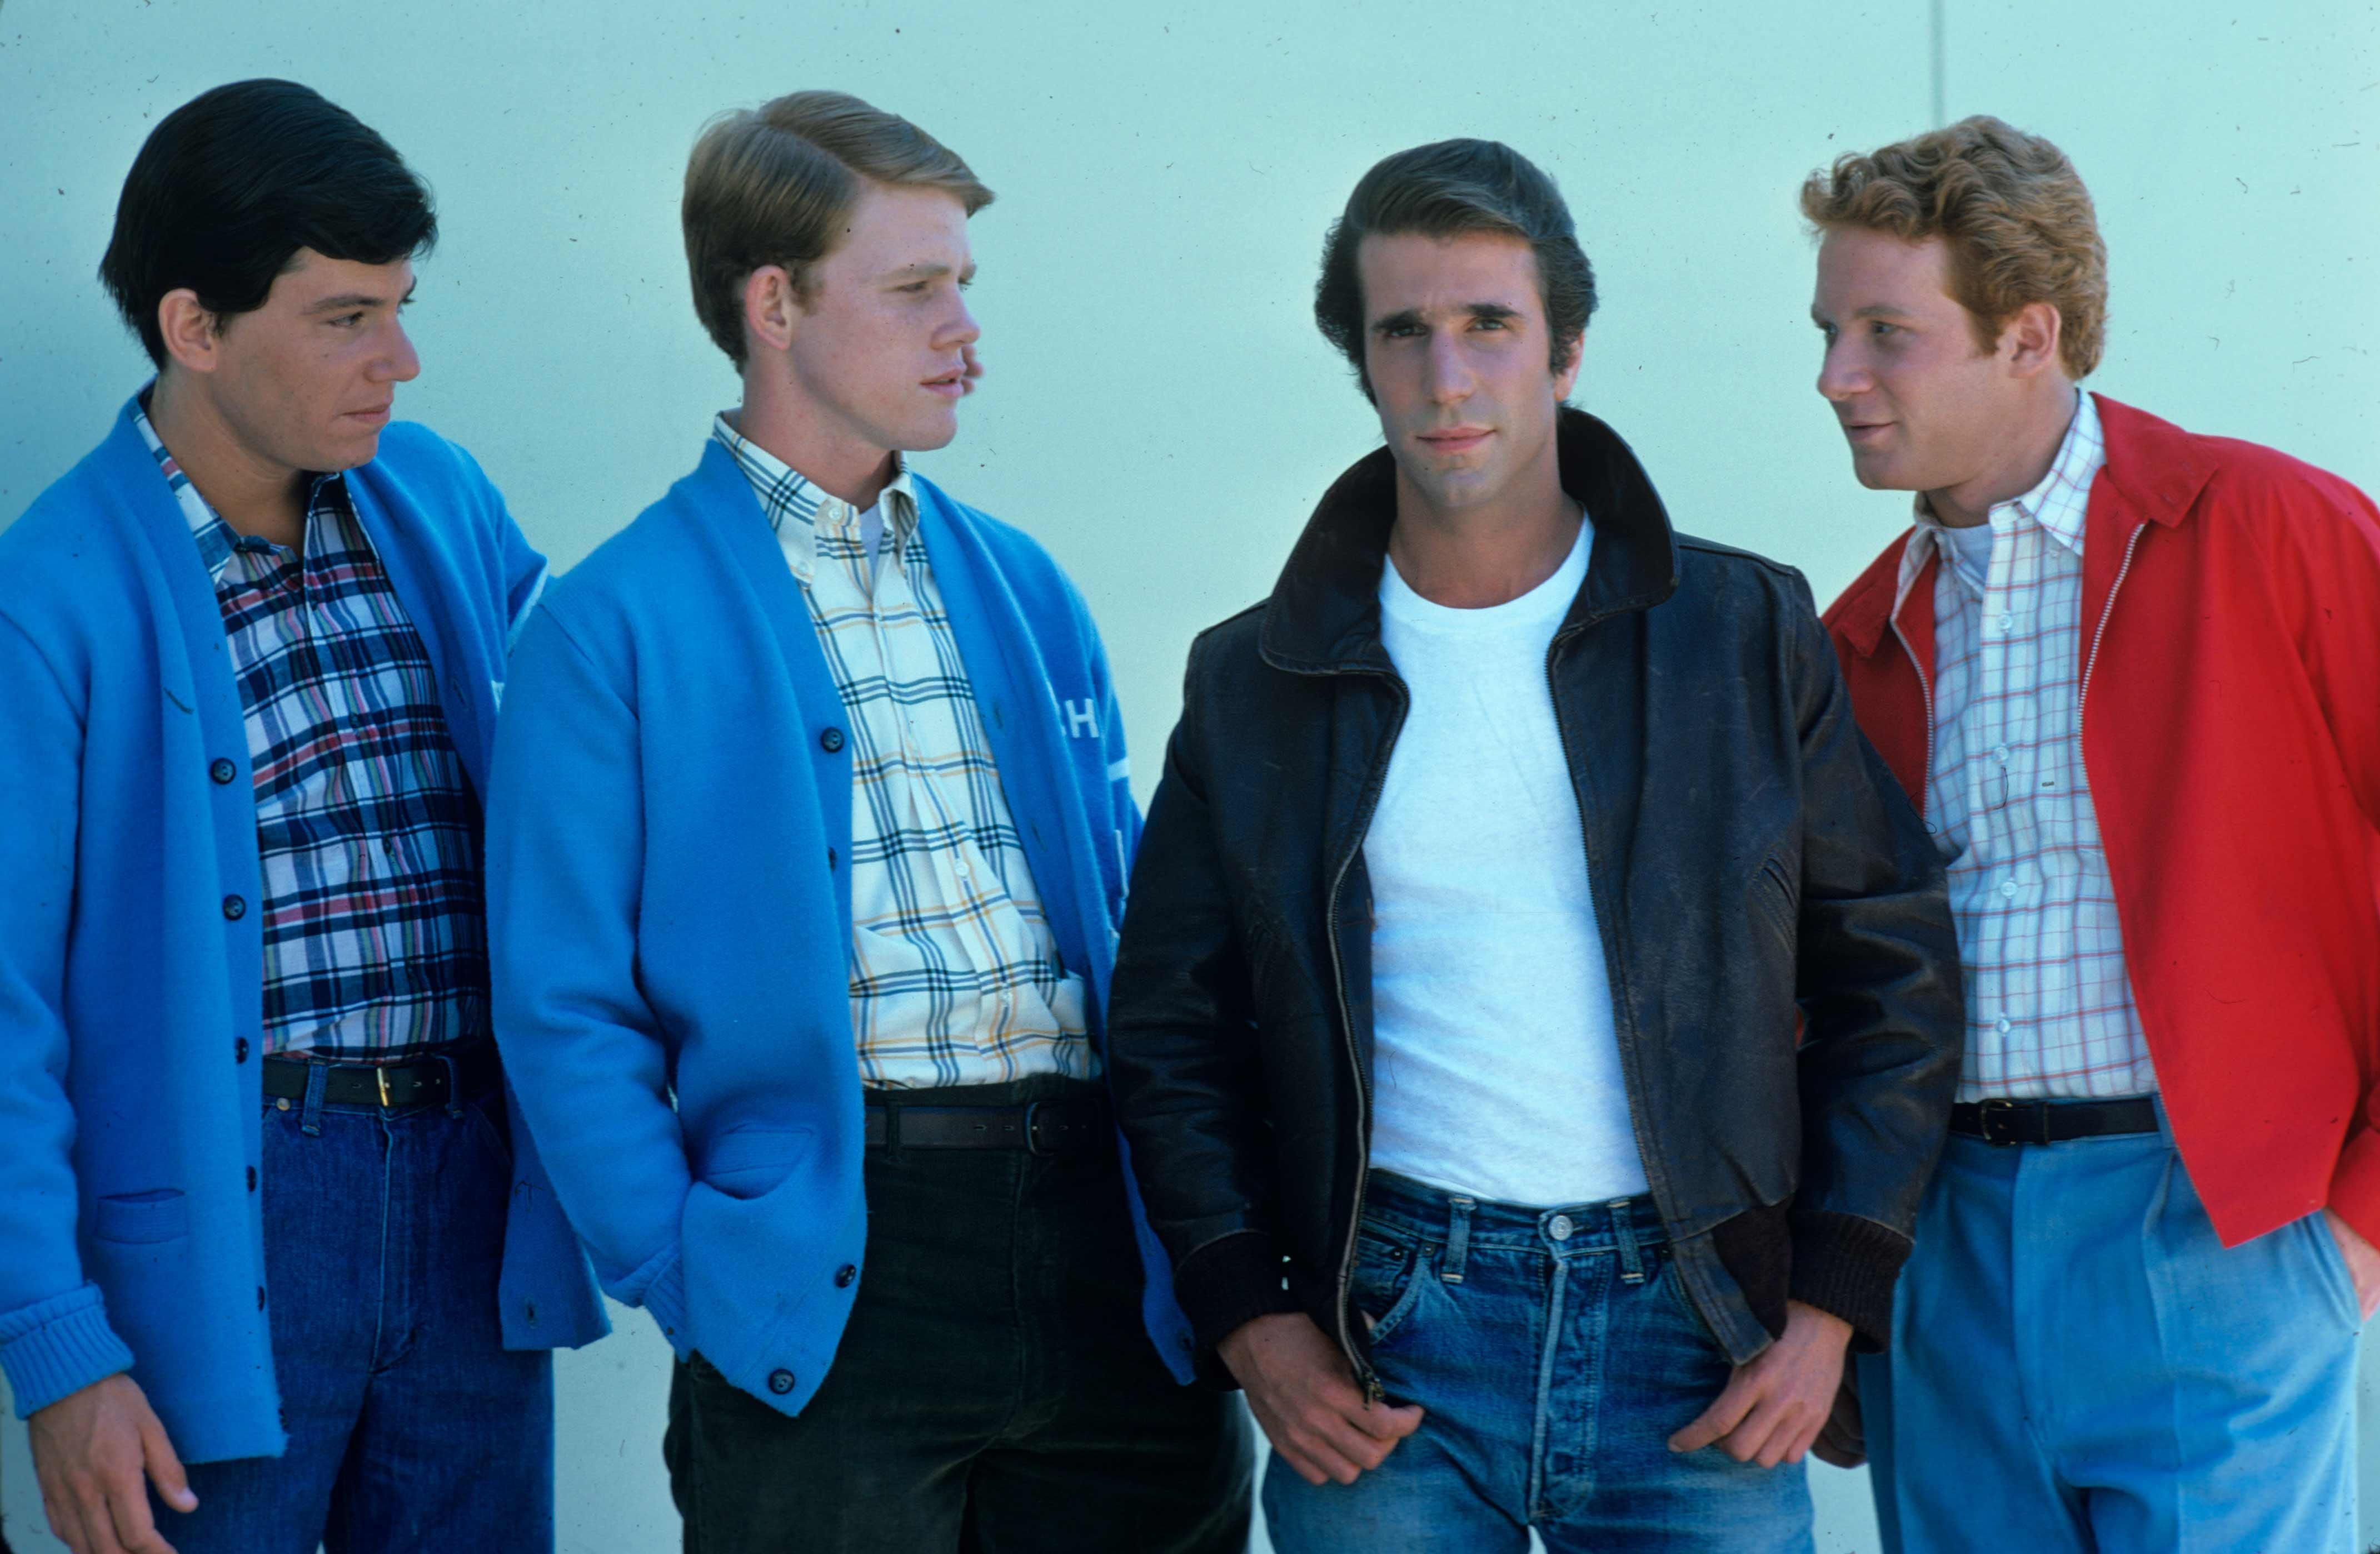 Fonzie with Potsie, Richie, and Ralph